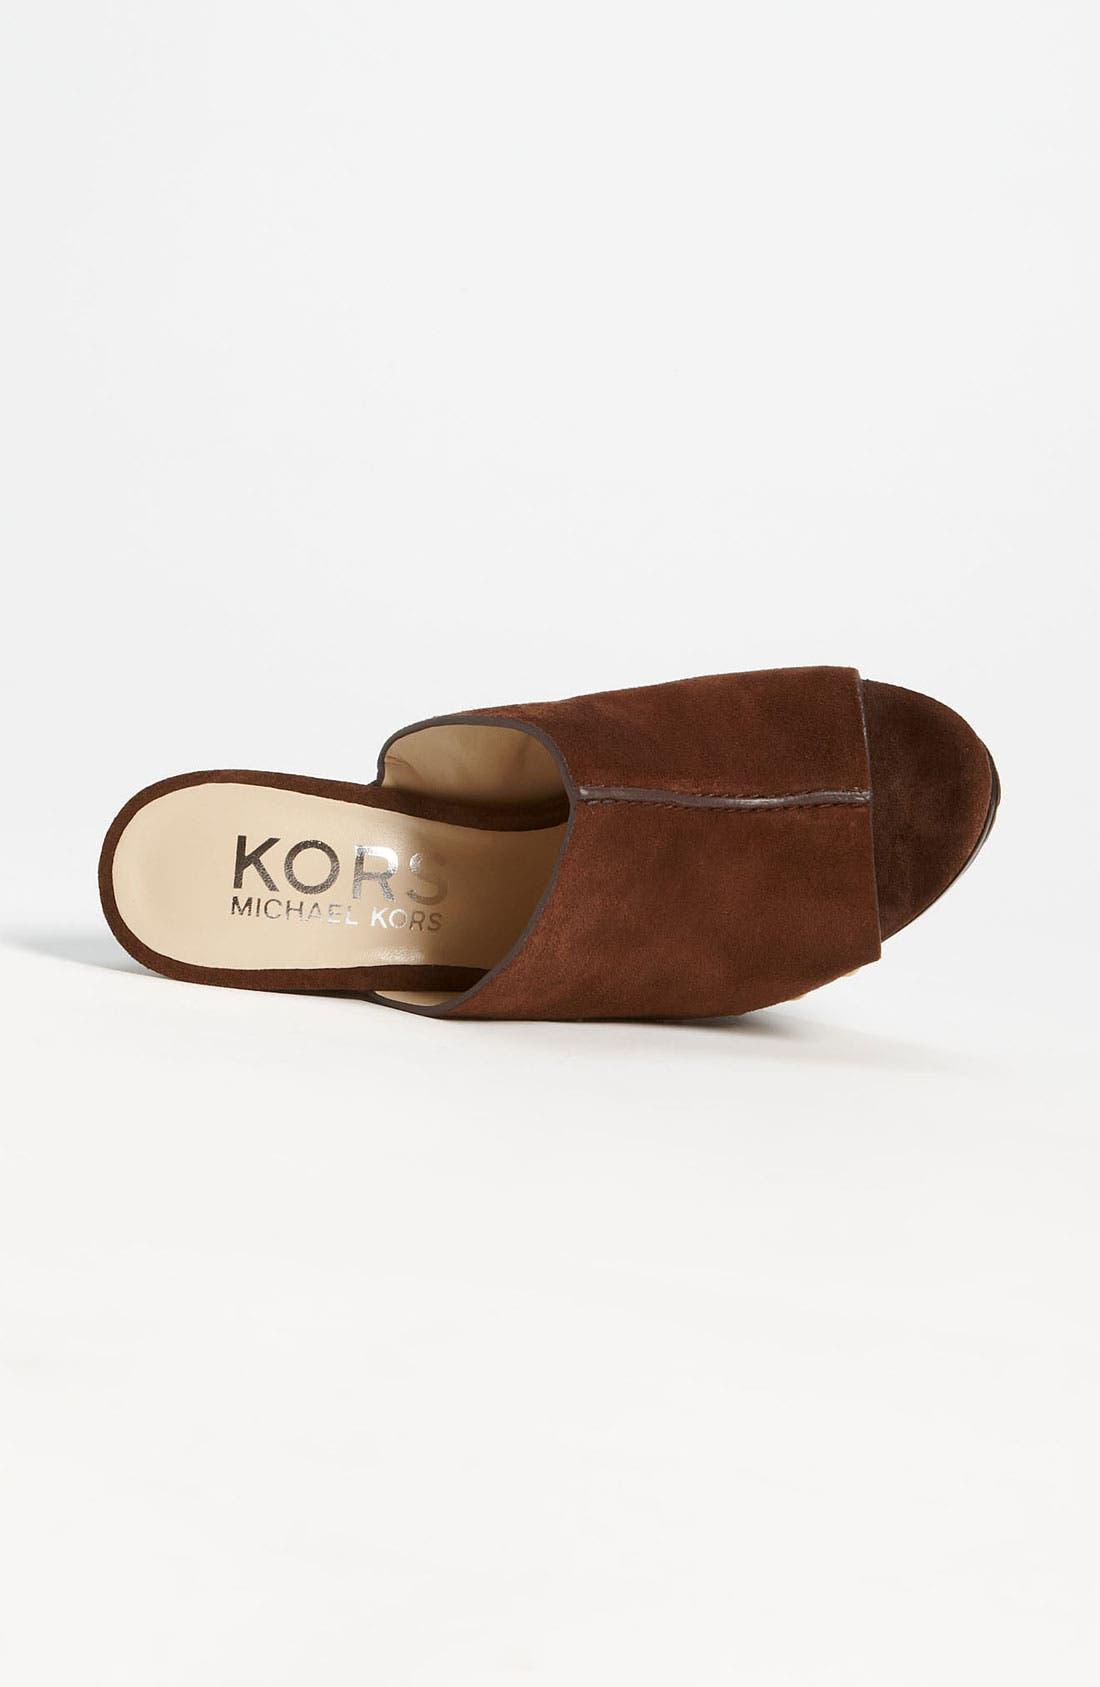 Alternate Image 3  - KORS Michael Kors 'Kempsey' Mule